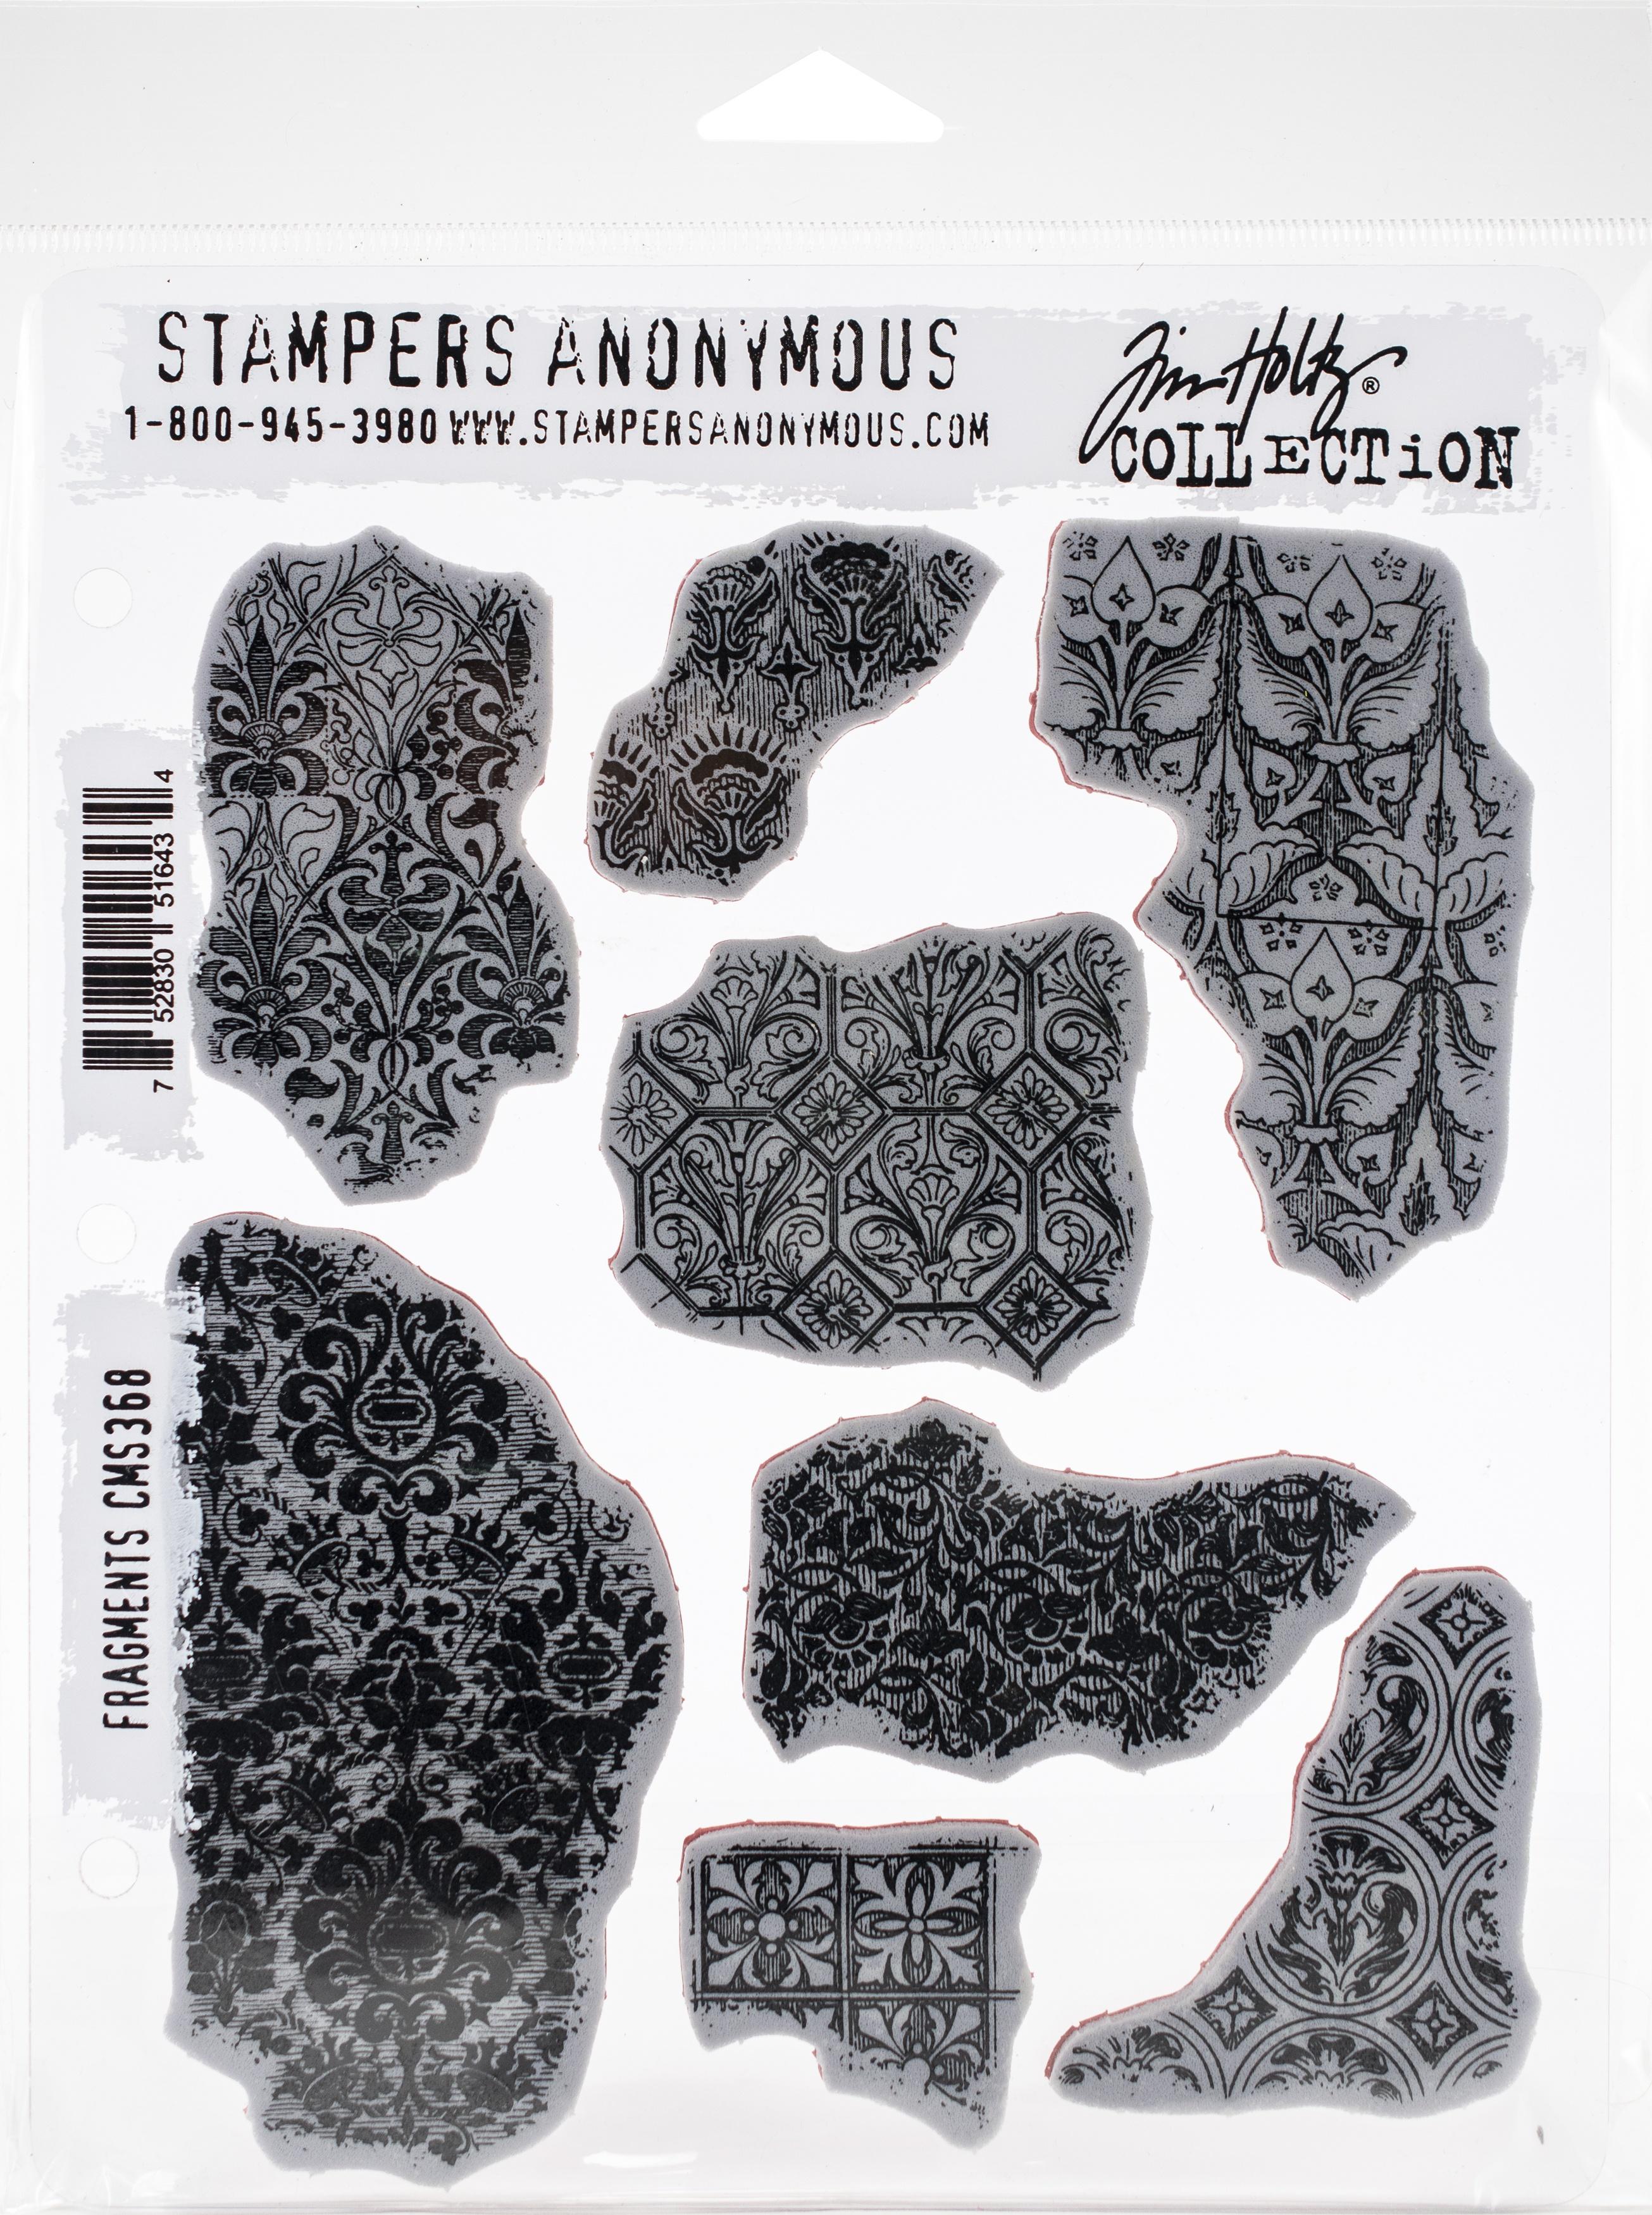 Tim Holtz - Cling Stamp - Fragments